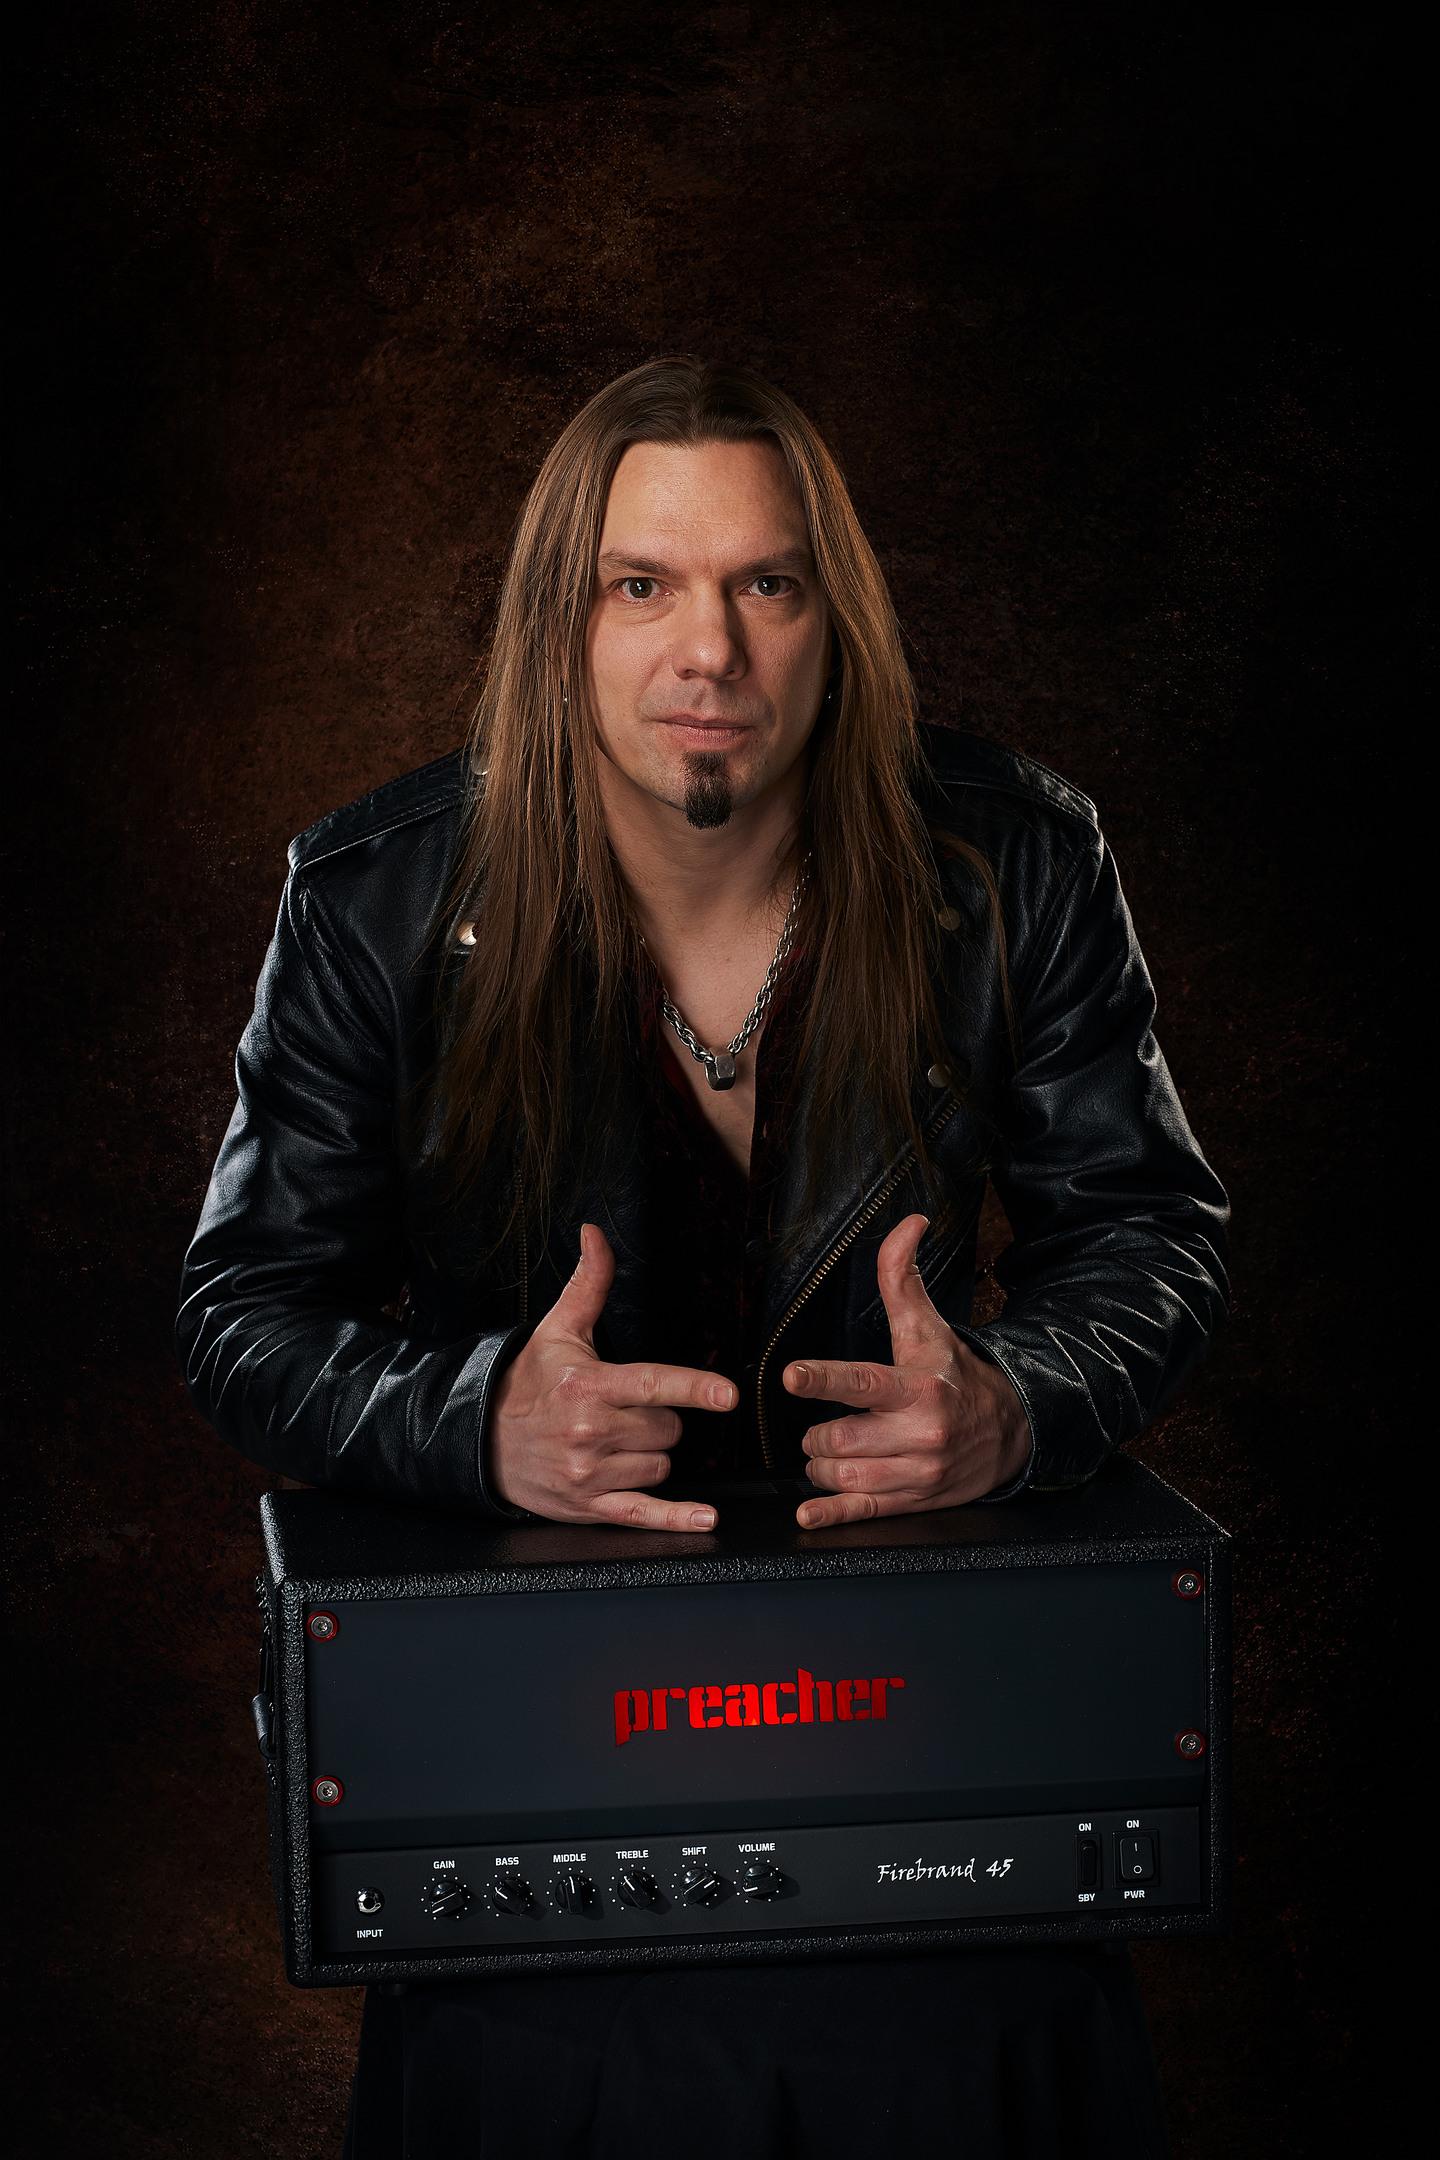 Preacher Amplifiers - Hämeenlinna